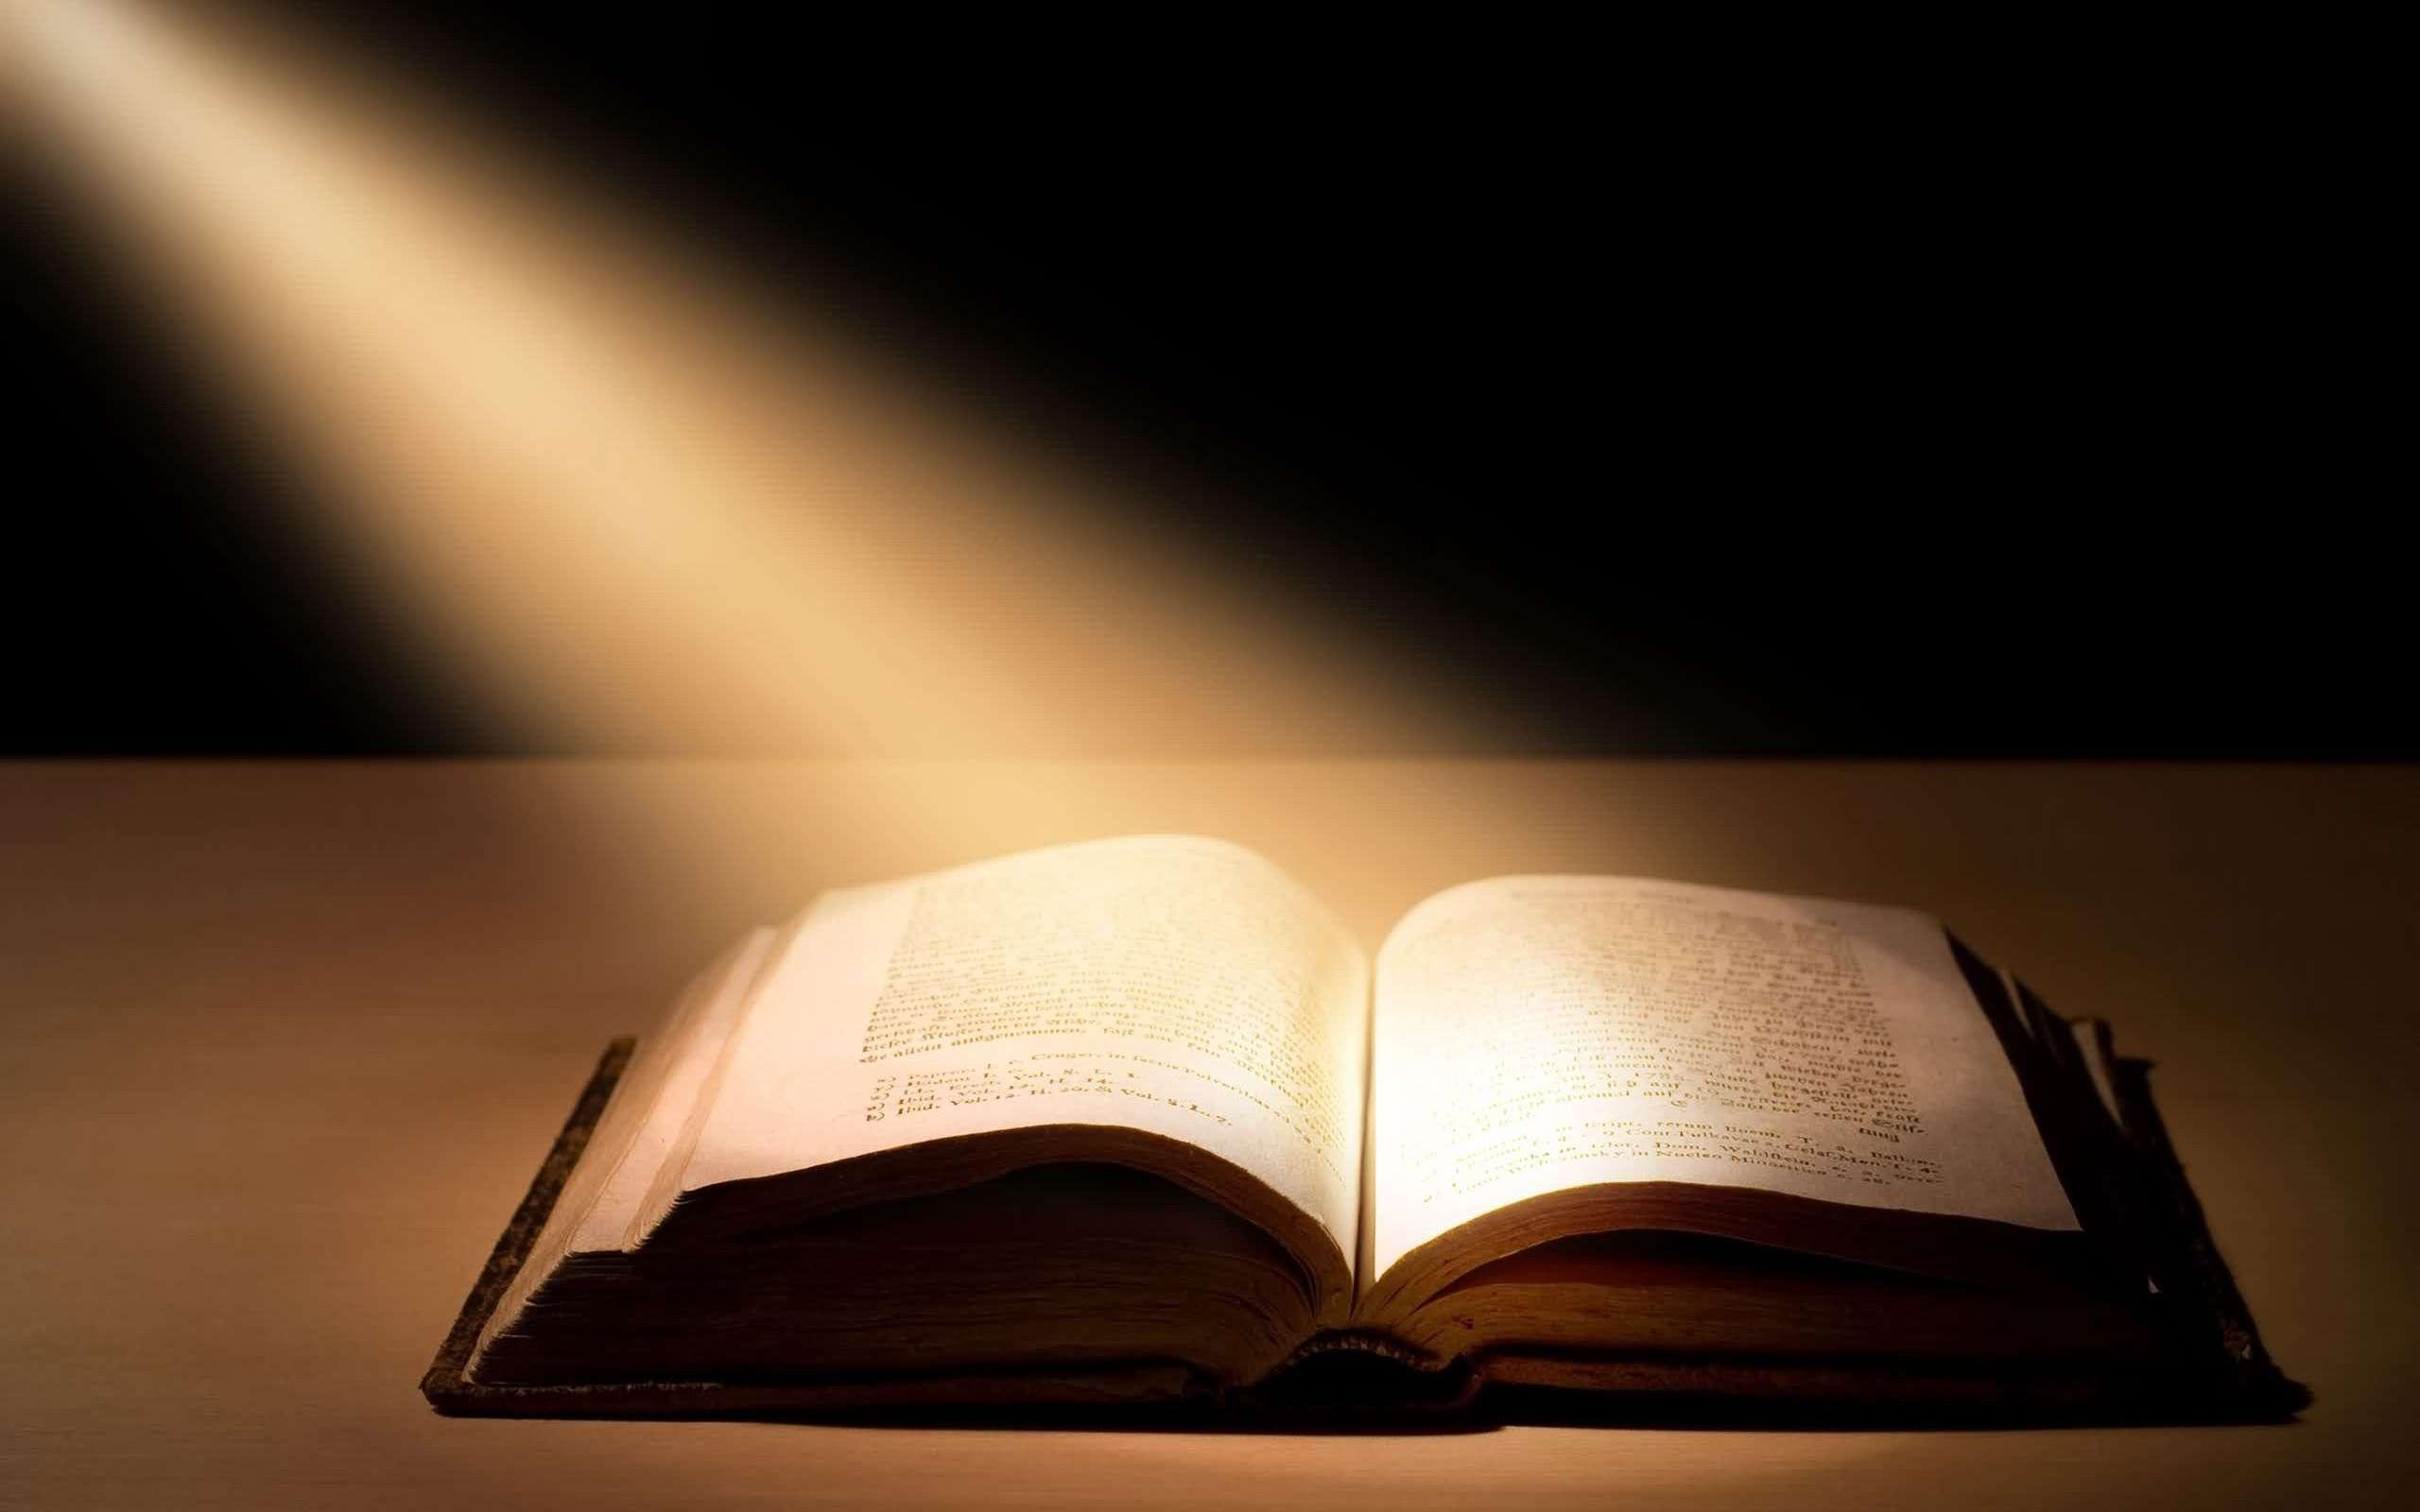 Bible Wallpapers - Full HD wallpaper search